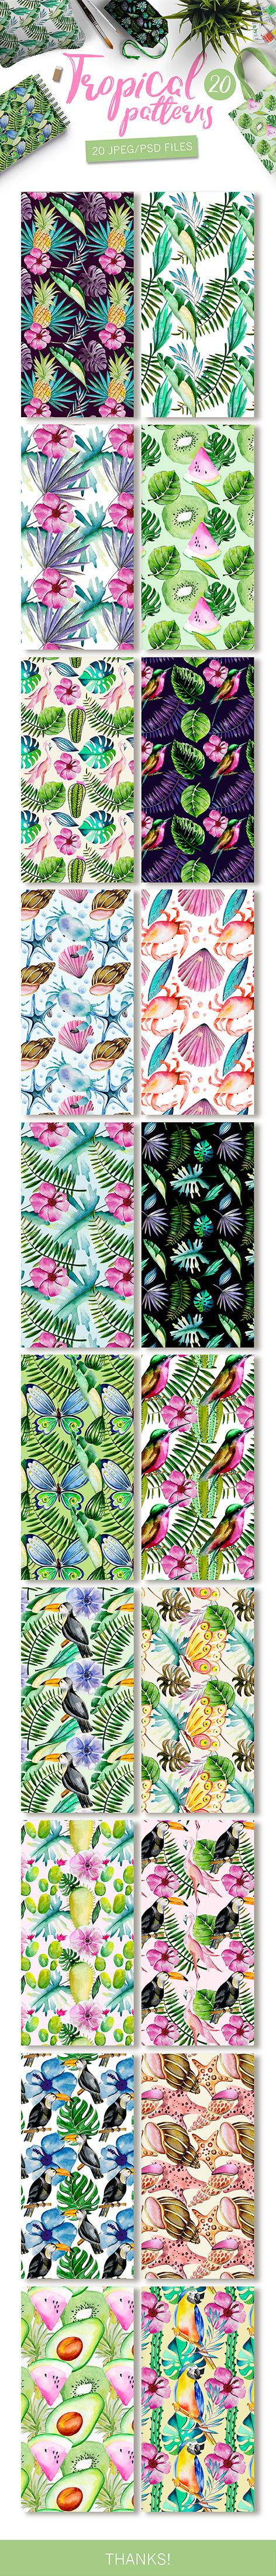 FLOWER FLORAL LEAF PRINT ALOHA HAWAII DESIGN WALLPAPER